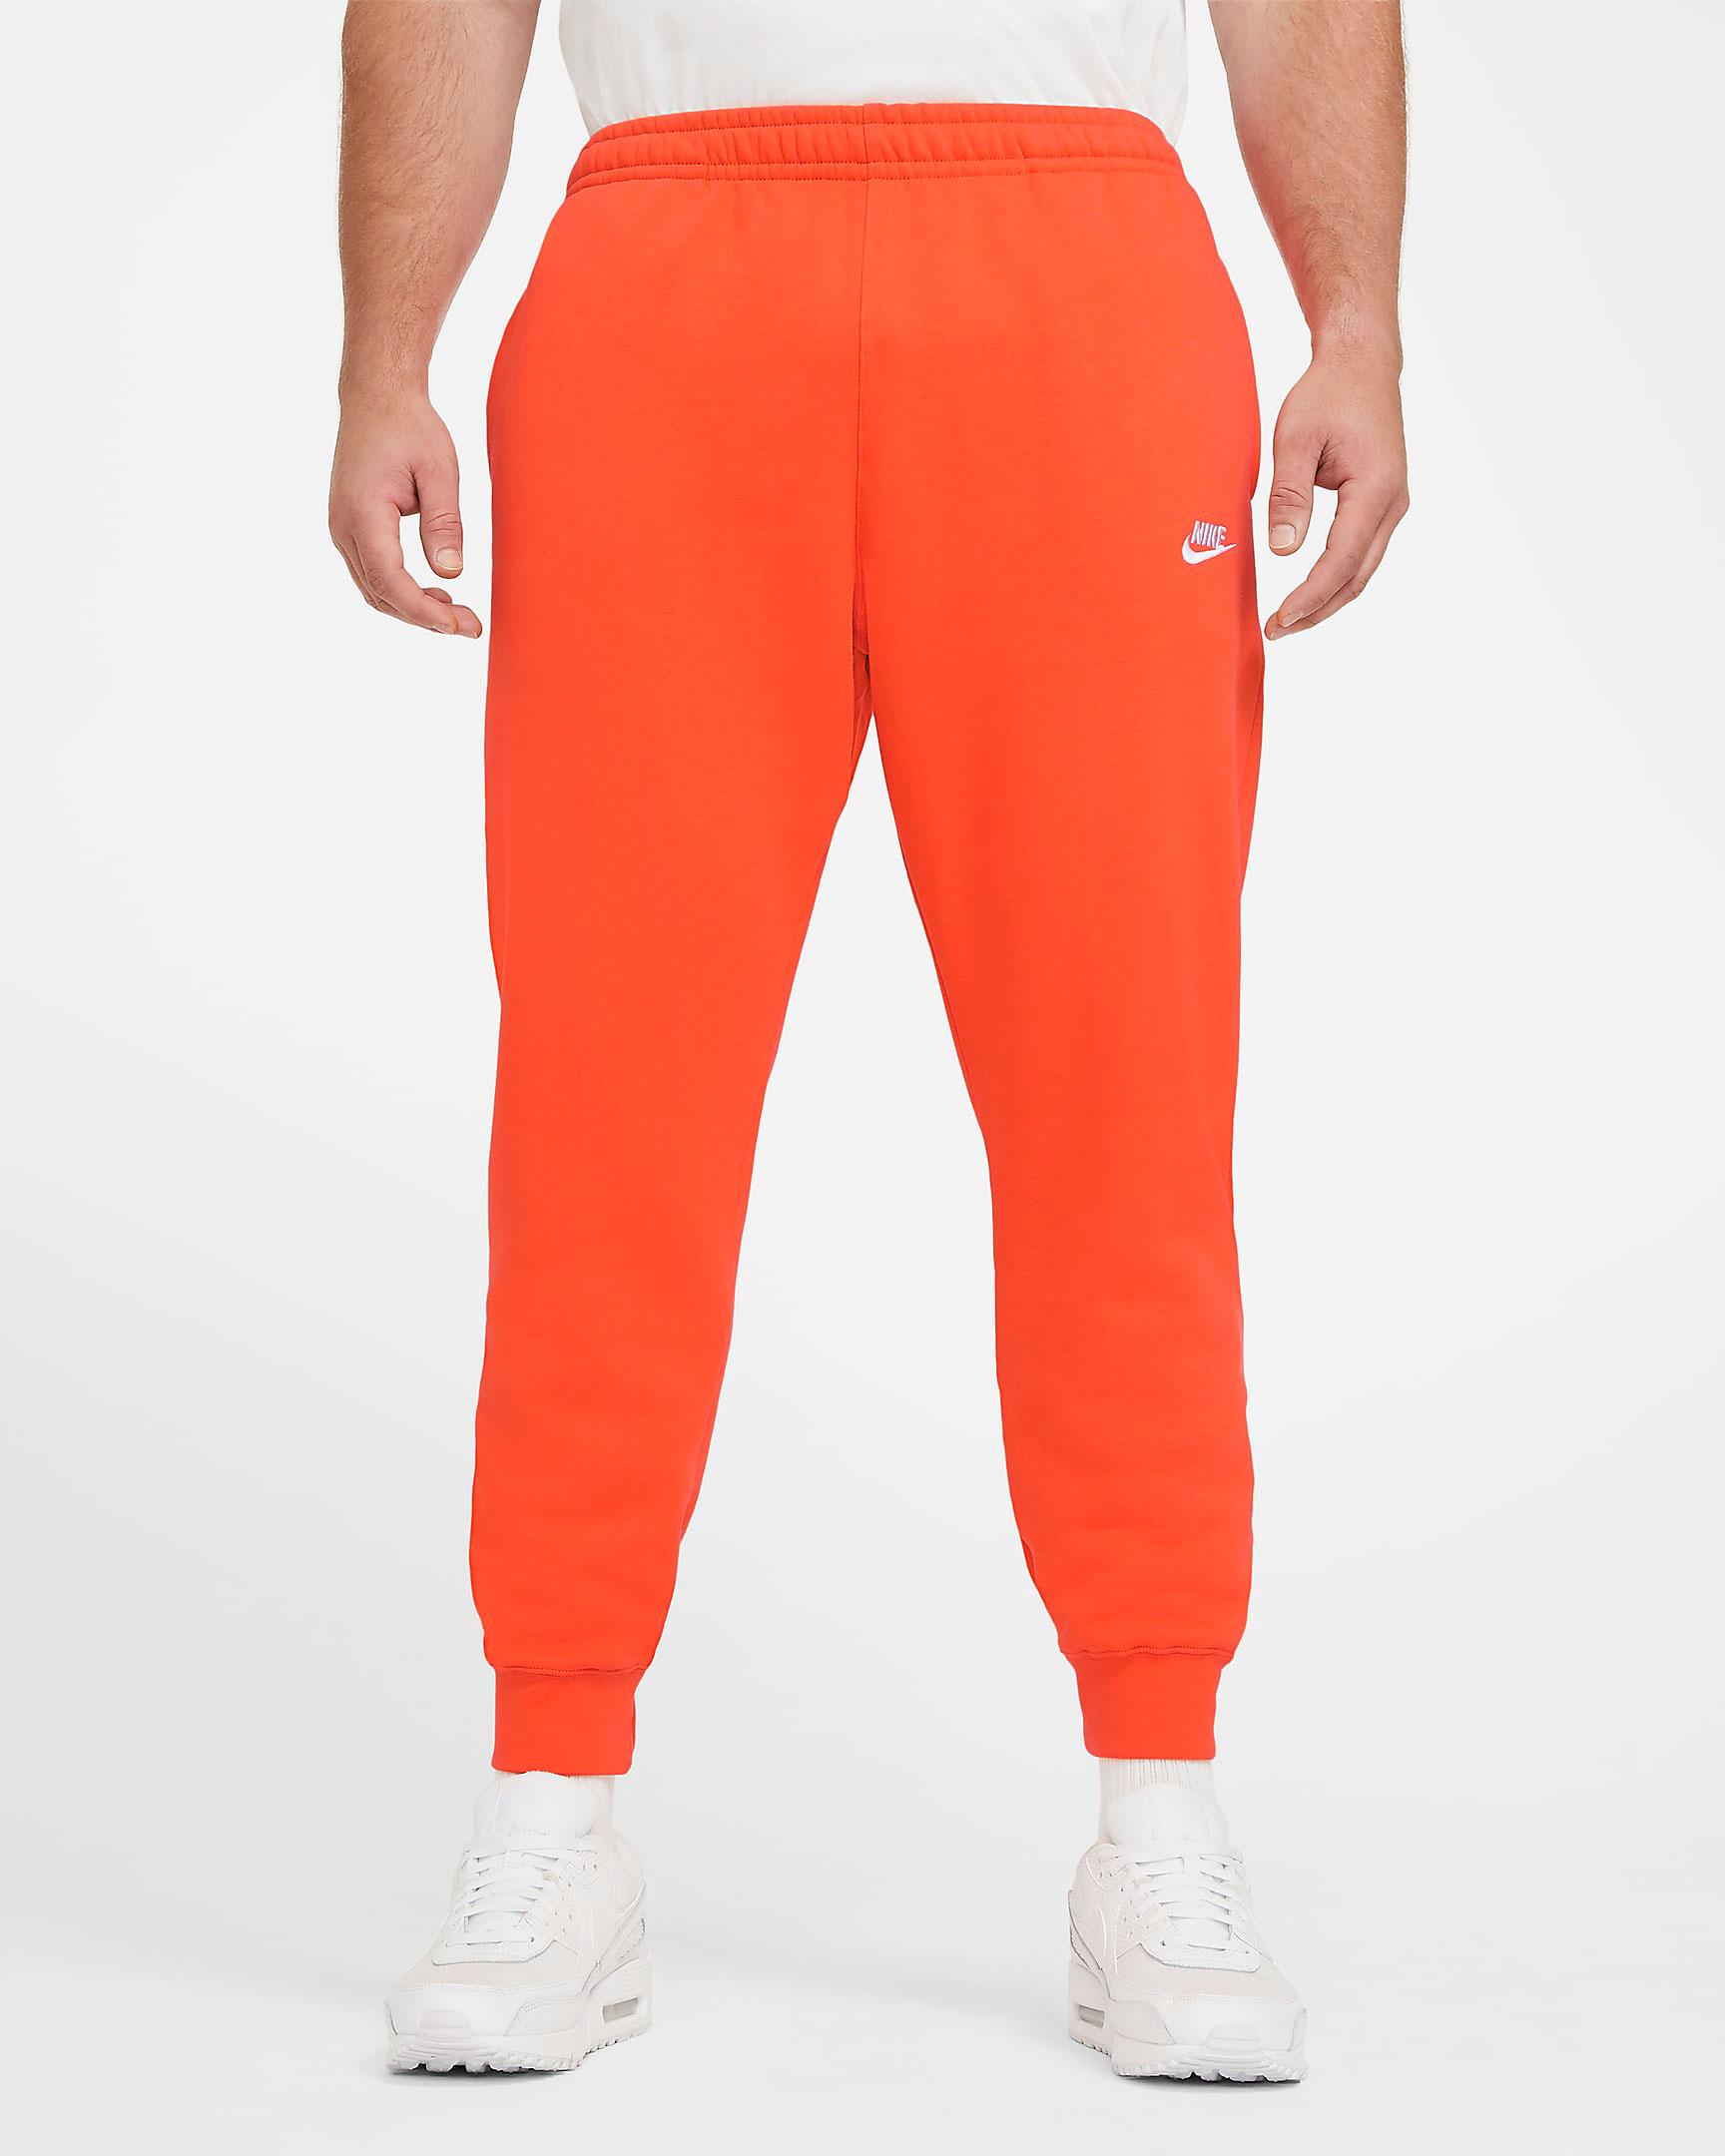 nike-air-foamposite-pro-halloween-orange-jogger-pants